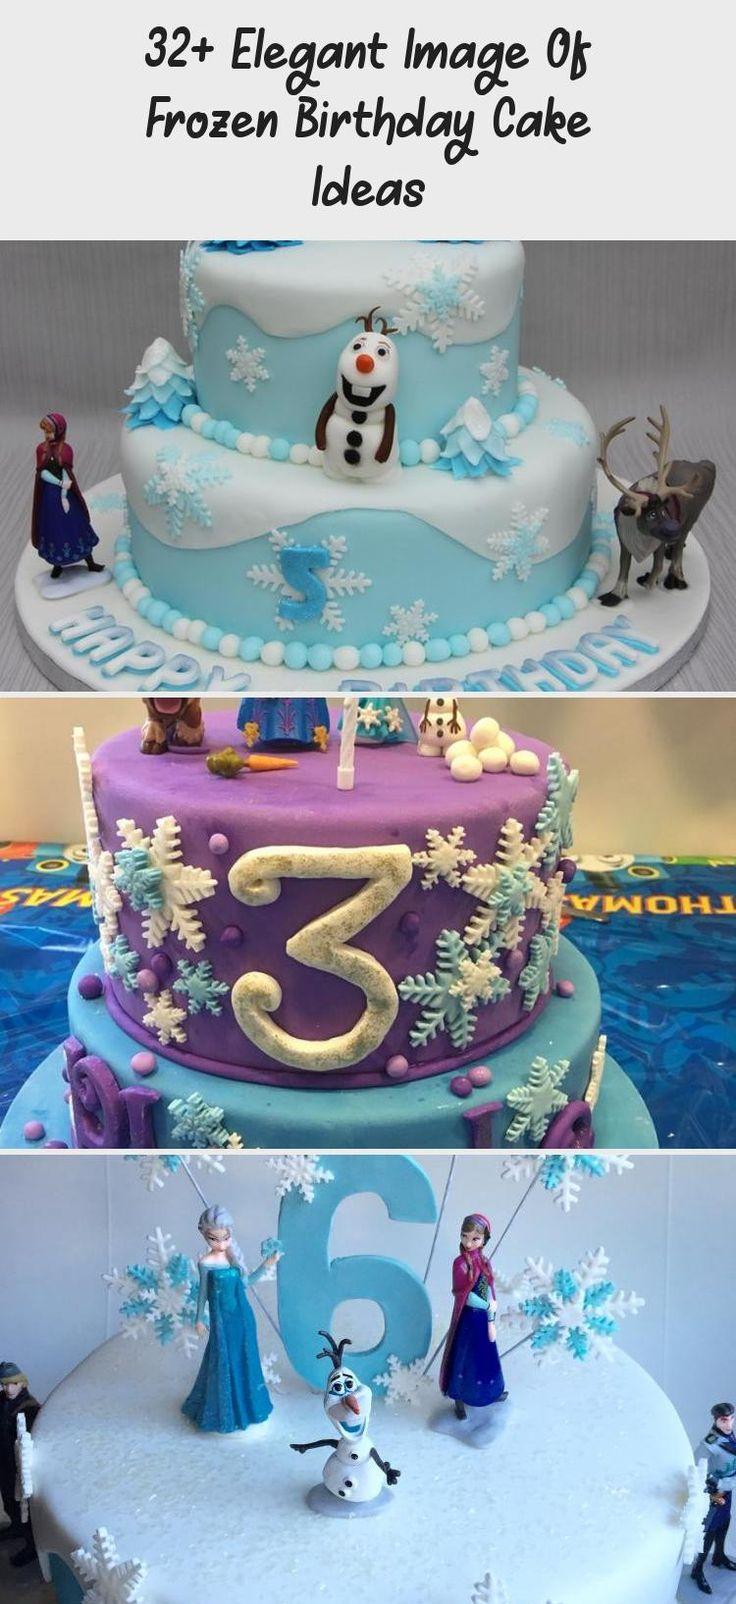 32+ Elegant Image Of Frozen Birthday Cake Ideas Frozen